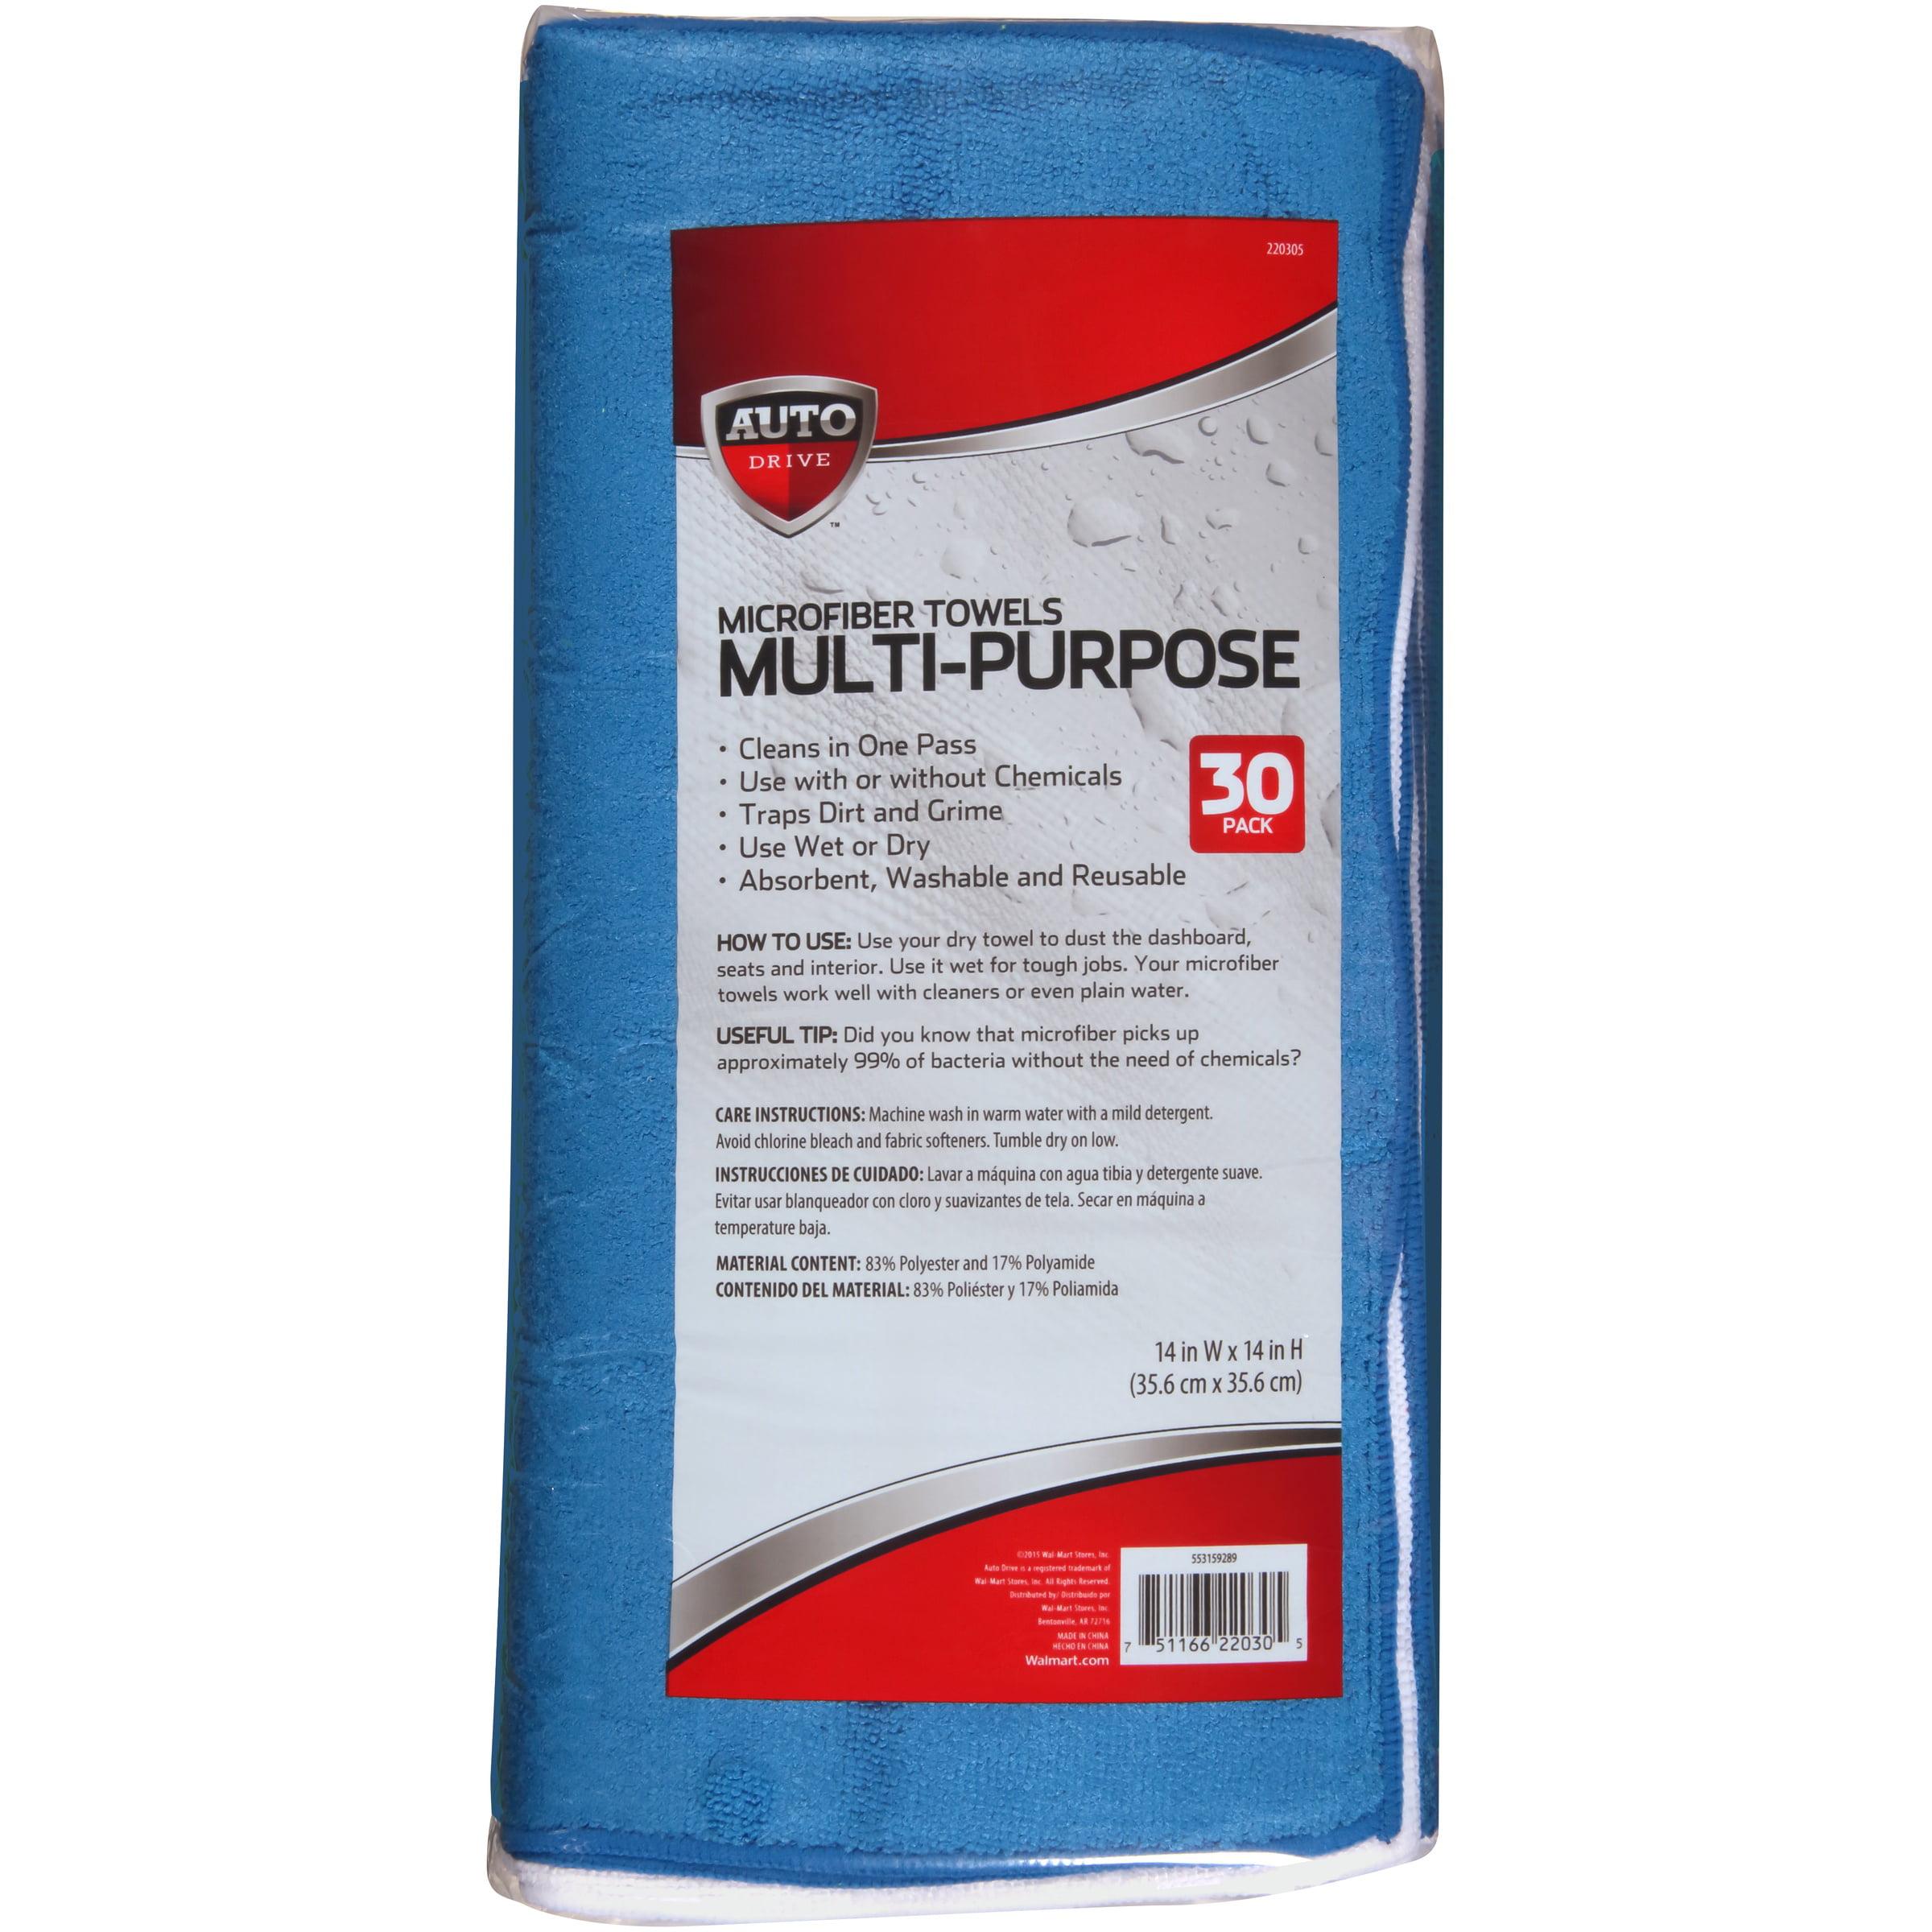 Auto Drive Multi-Purpose Microfiber Towels 30 ct Bag - Walmart.com